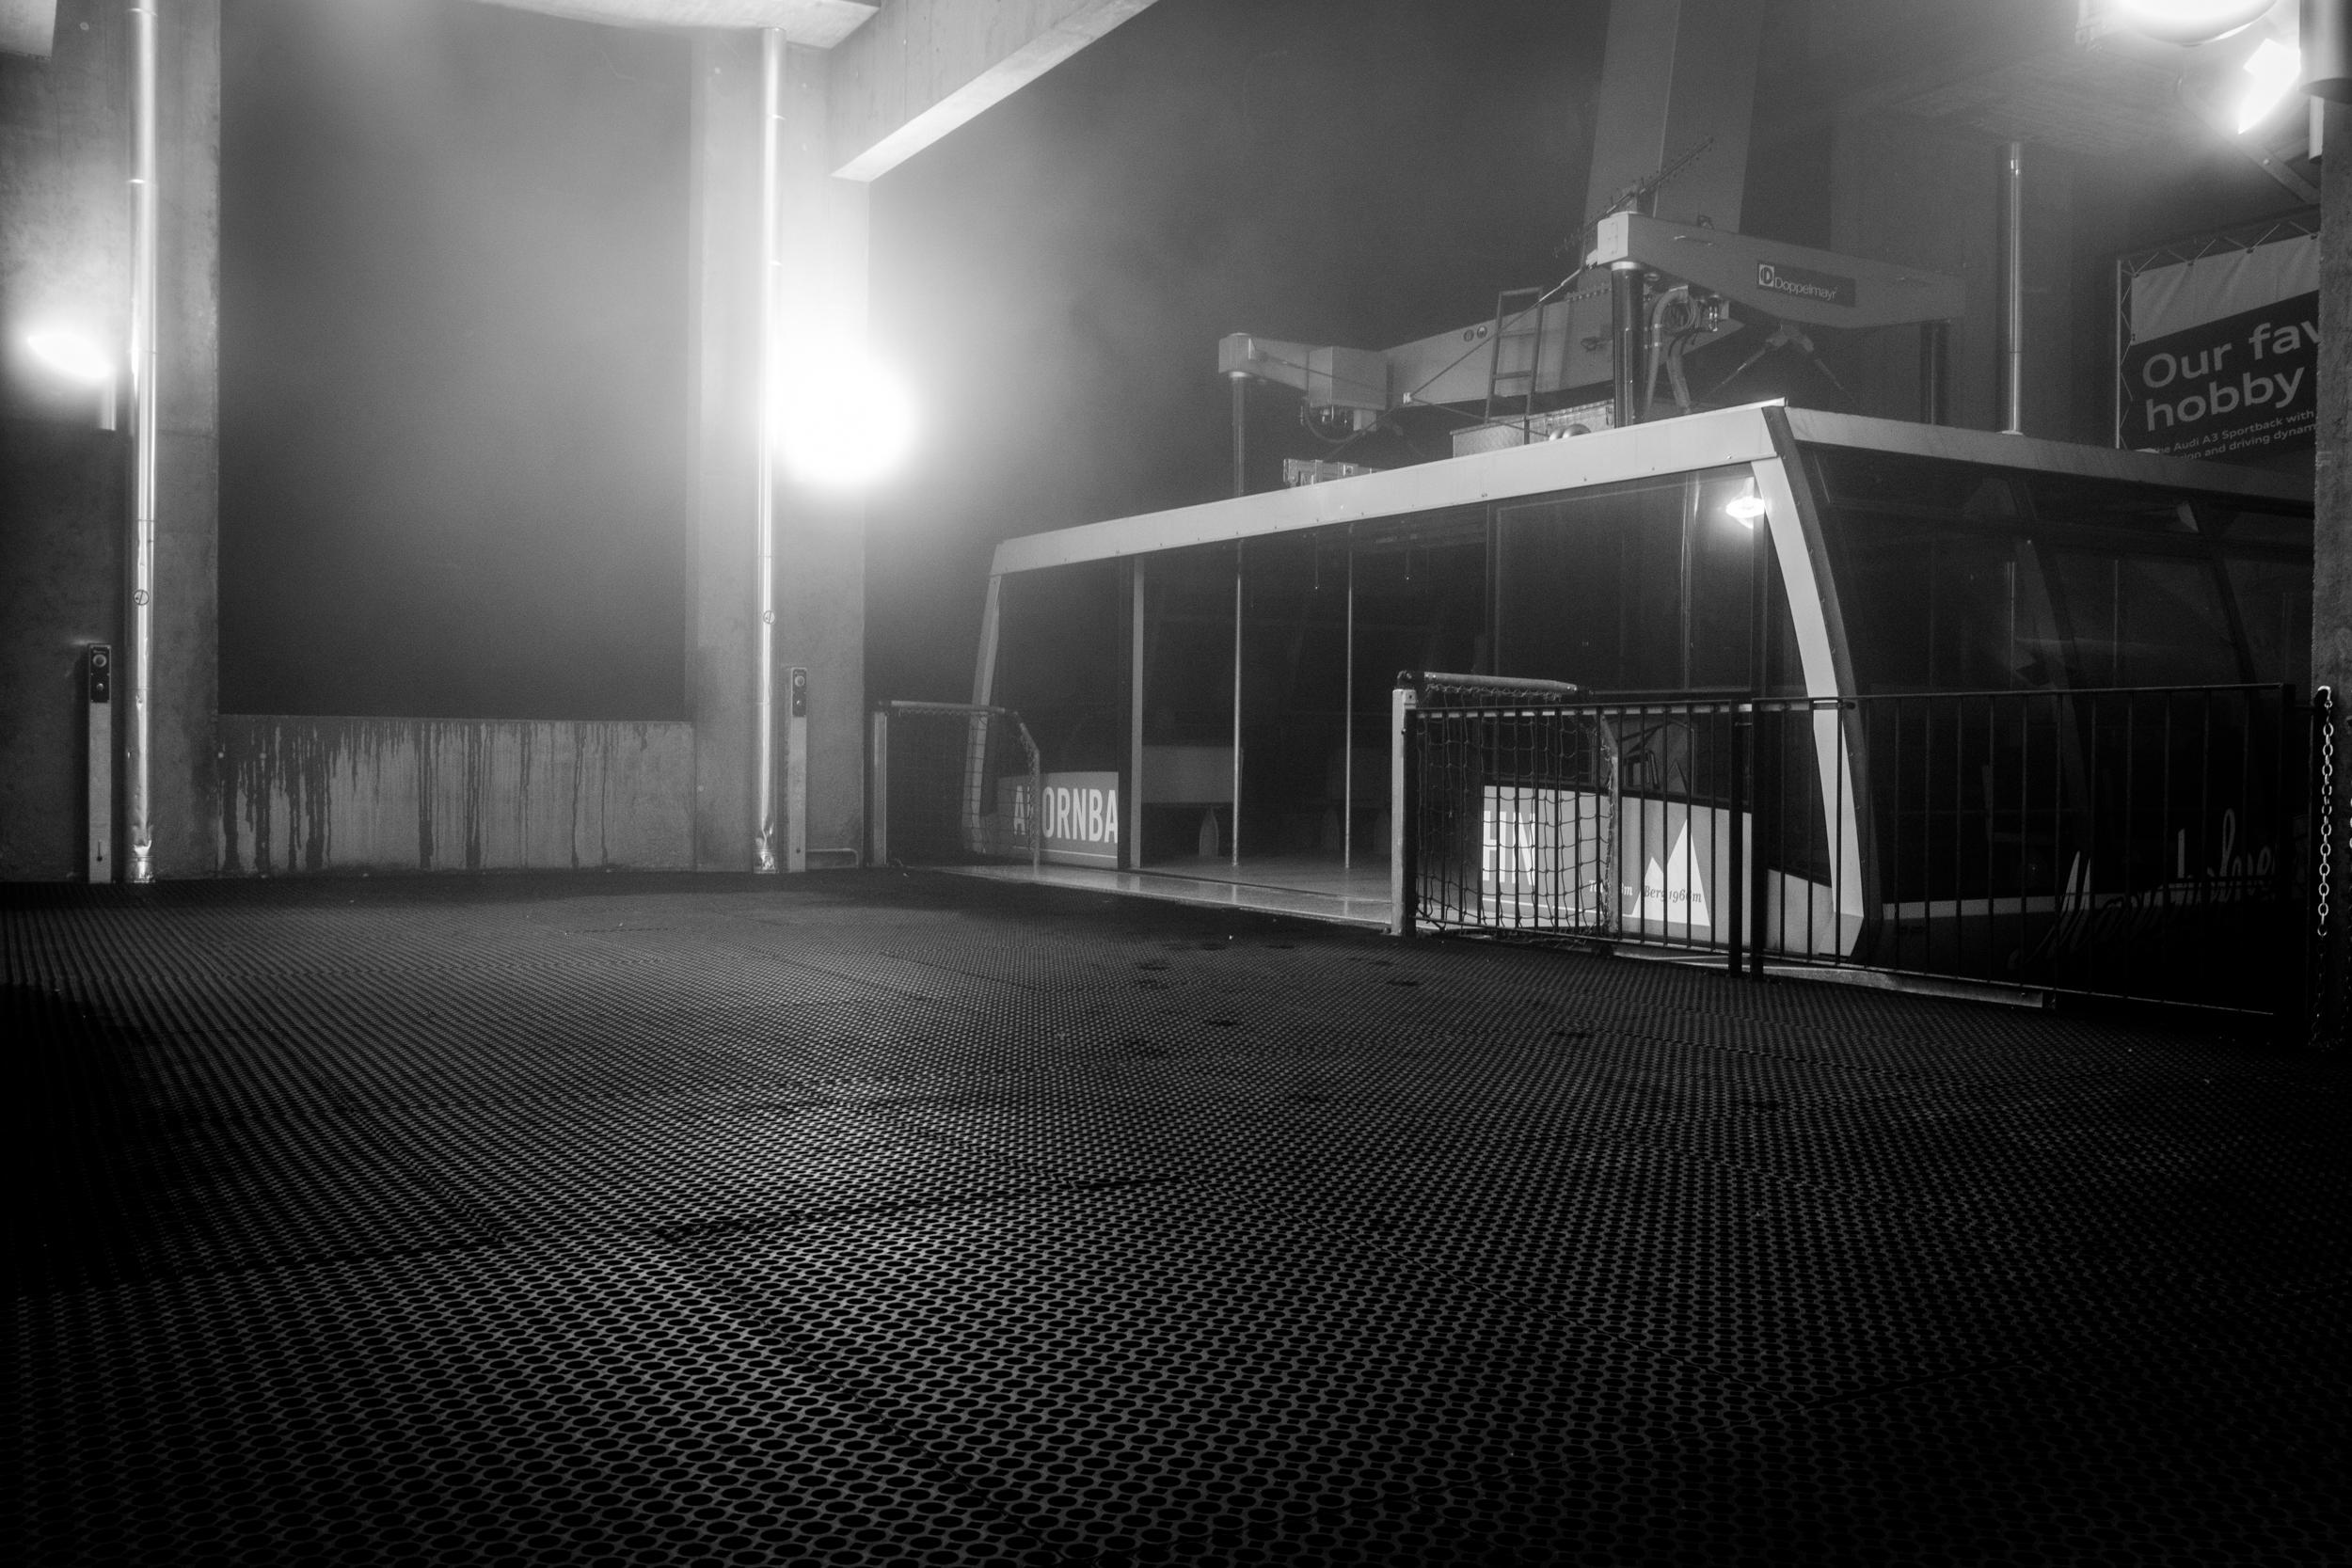 ahornbahn late night.jpg